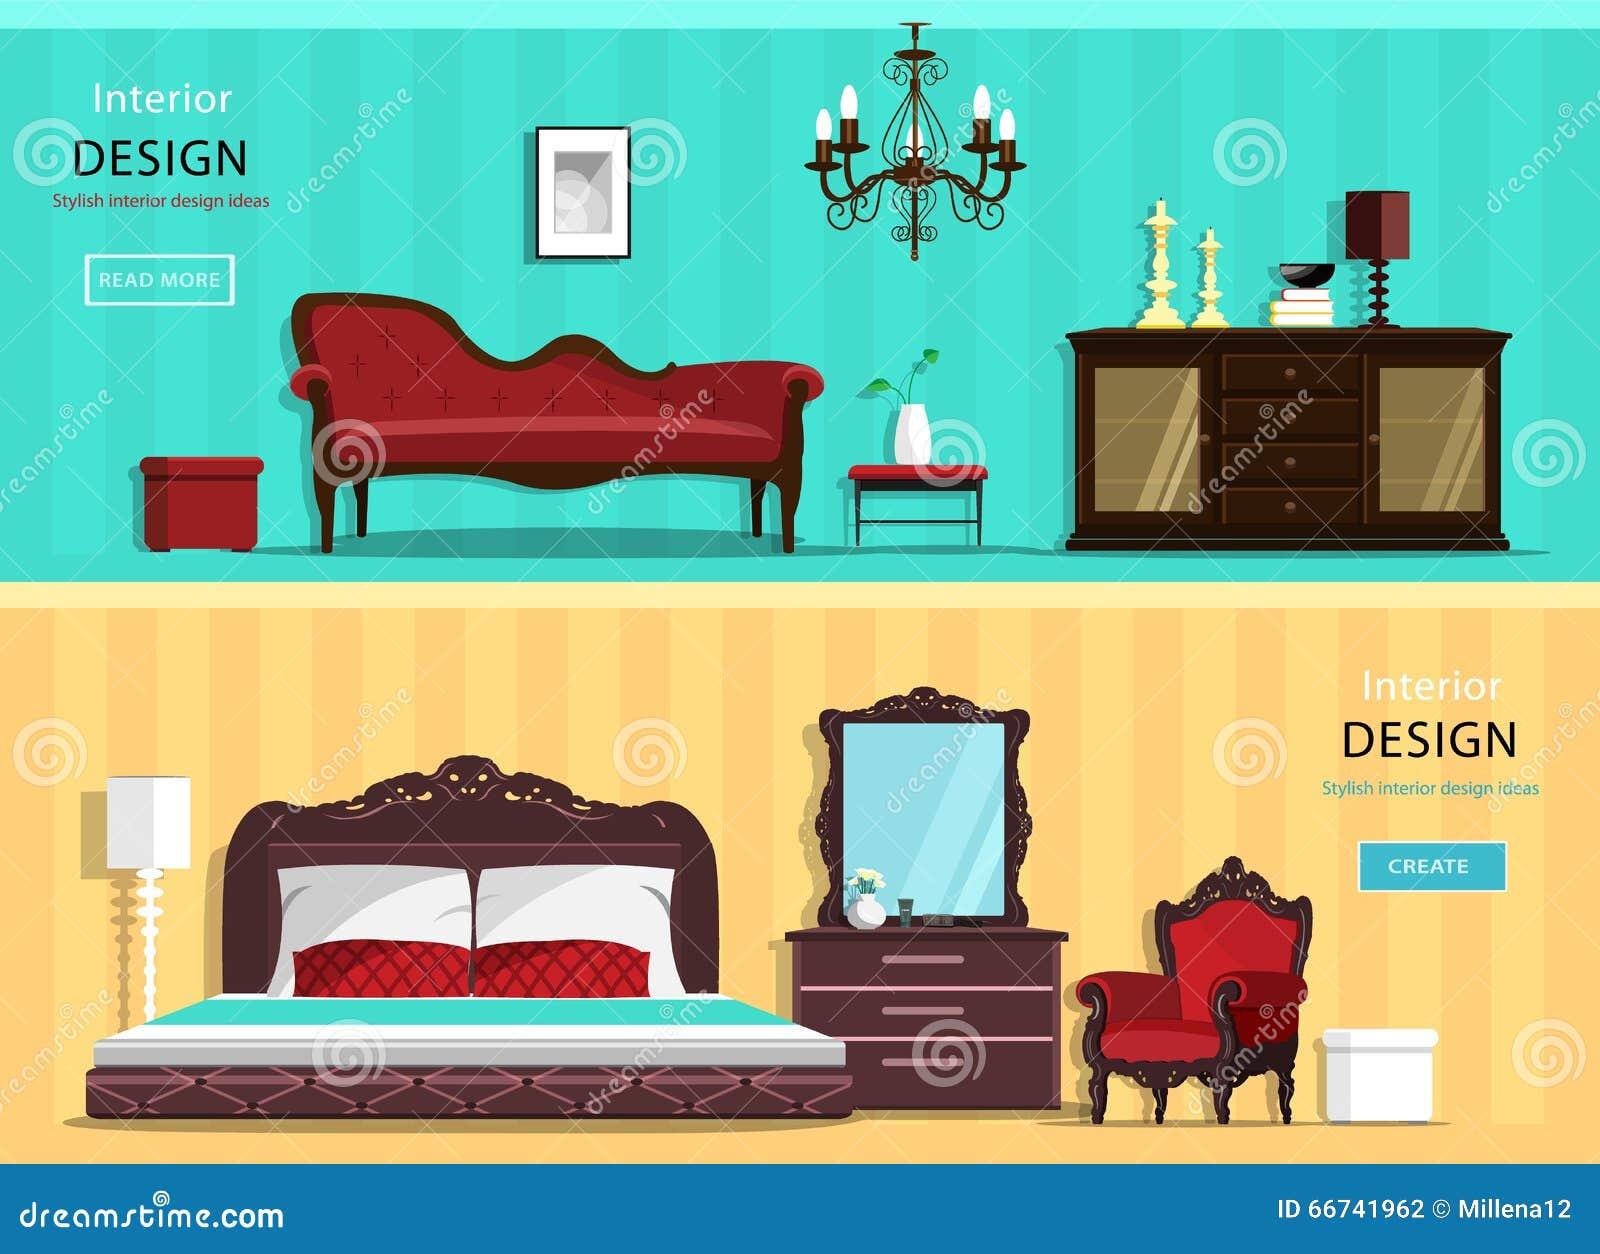 Muebles Sala Set Obtenga Ideas Dise 241 O De Muebles Para Su